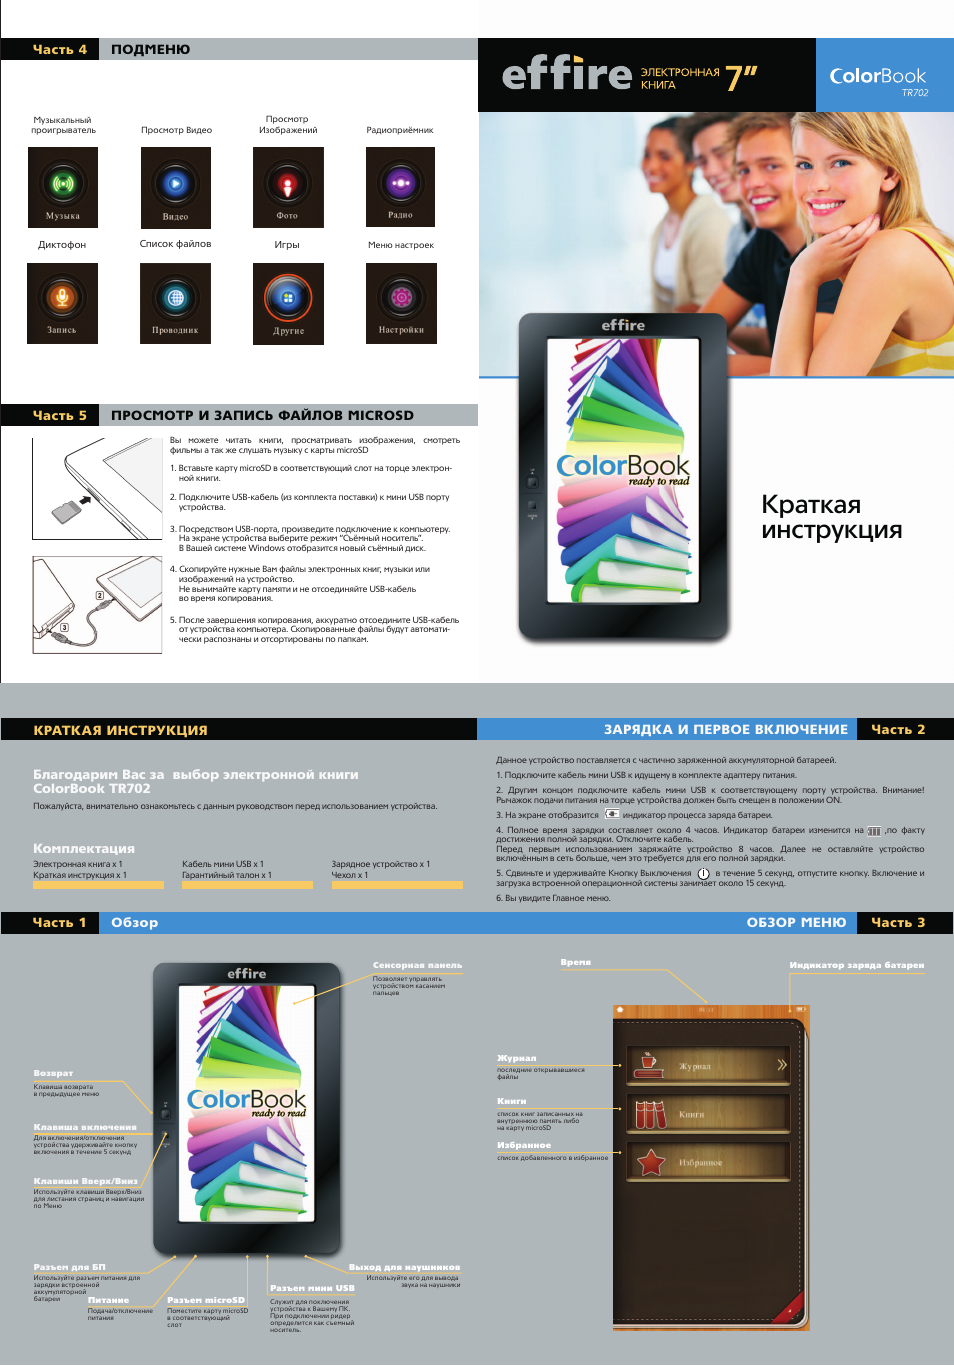 Color book effire - Color Book Effire 12